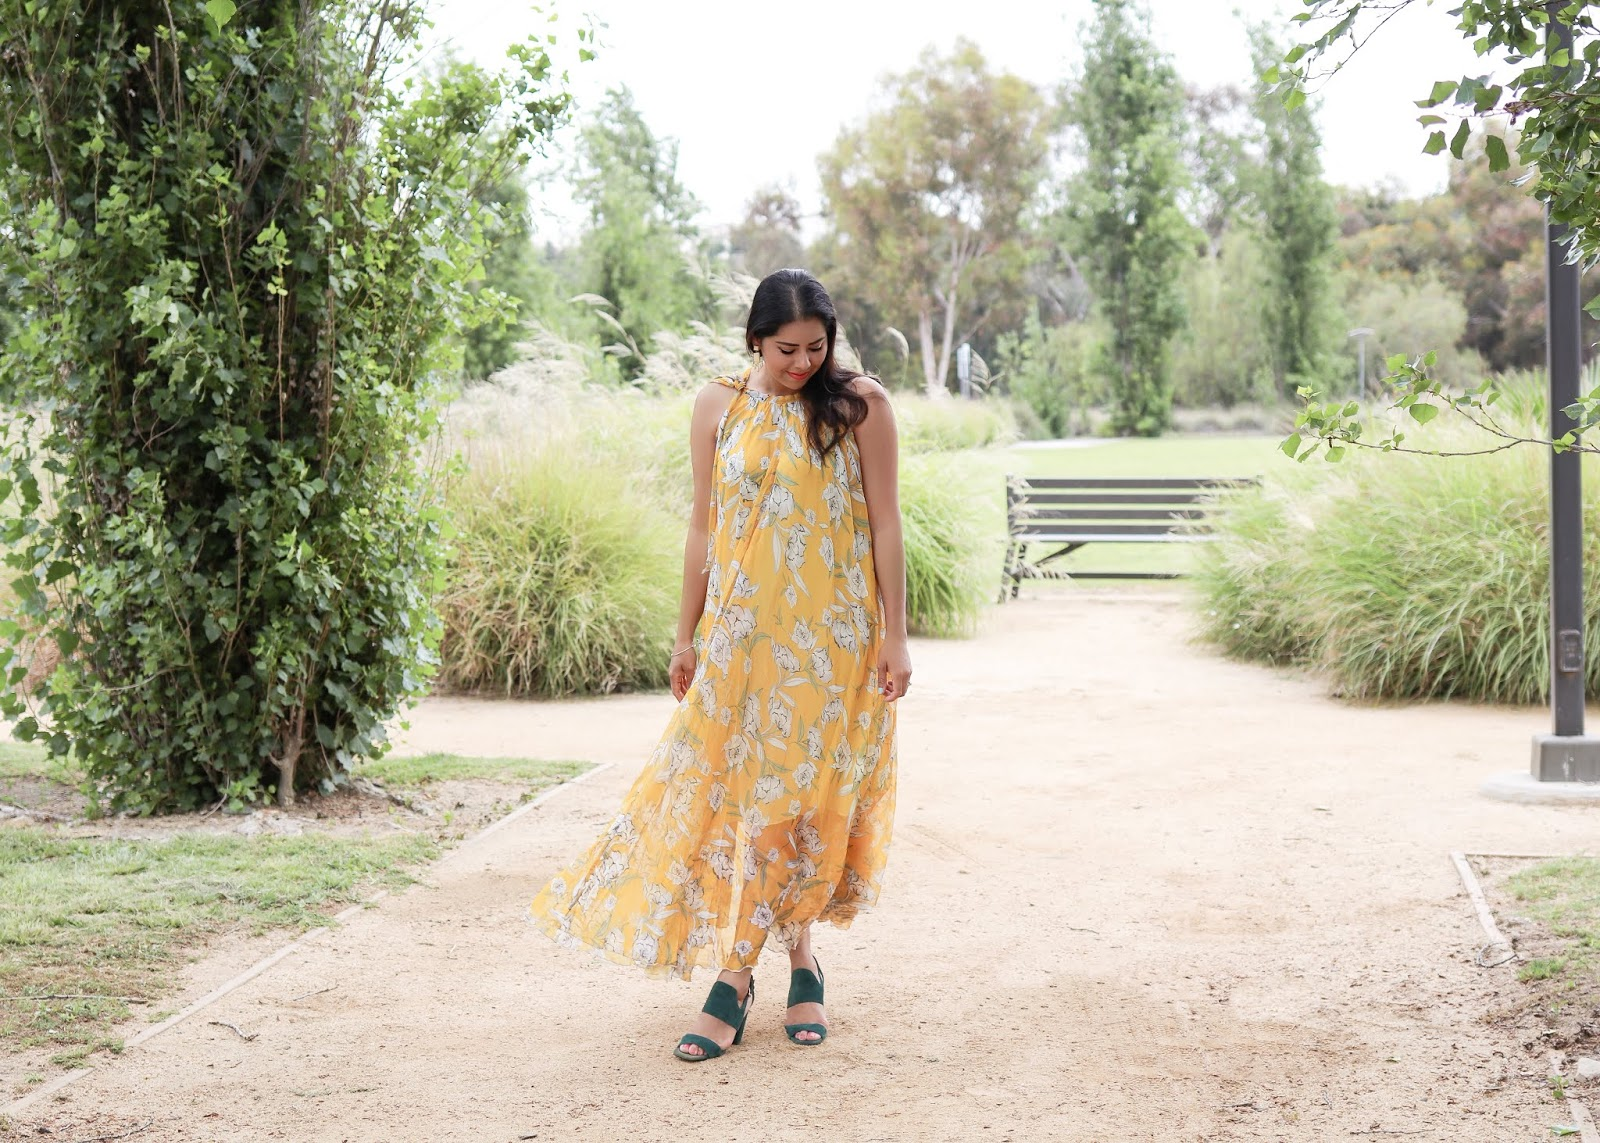 san diego fashion blogger outfit, san diego fashion blogger 2018